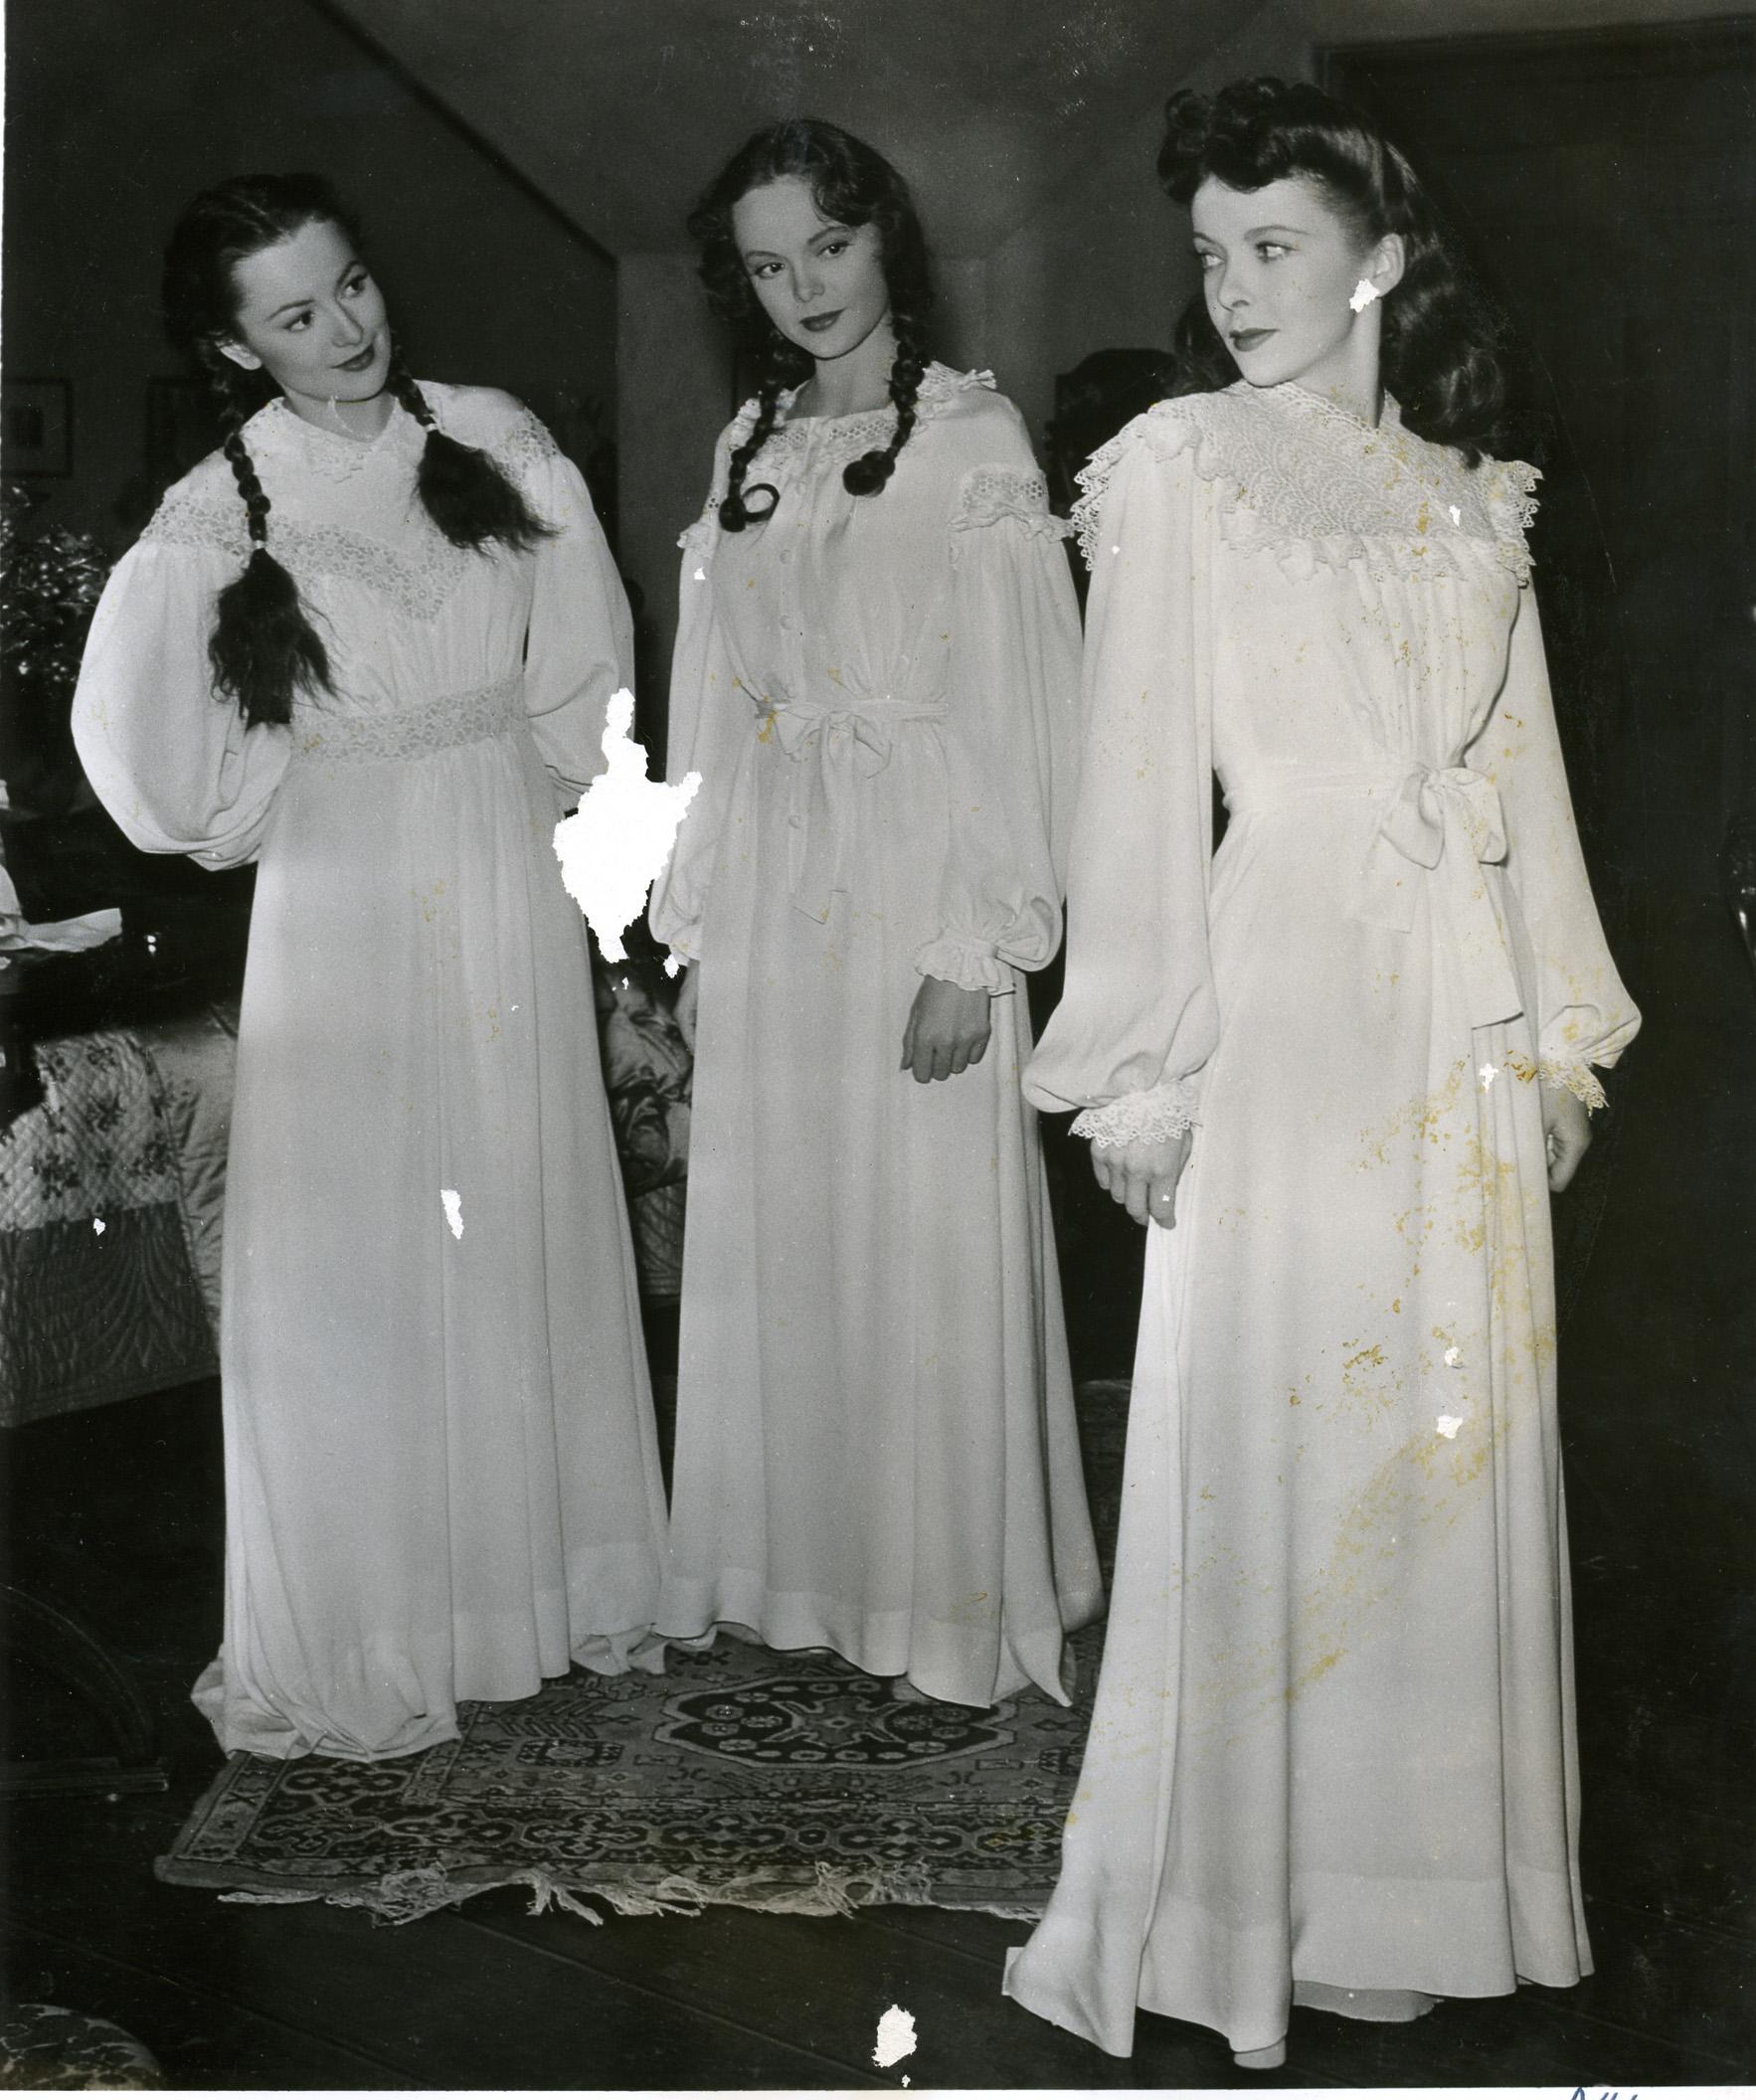 (L to R) Olivia de Havilland, Nancy Coleman, Ida Lupino